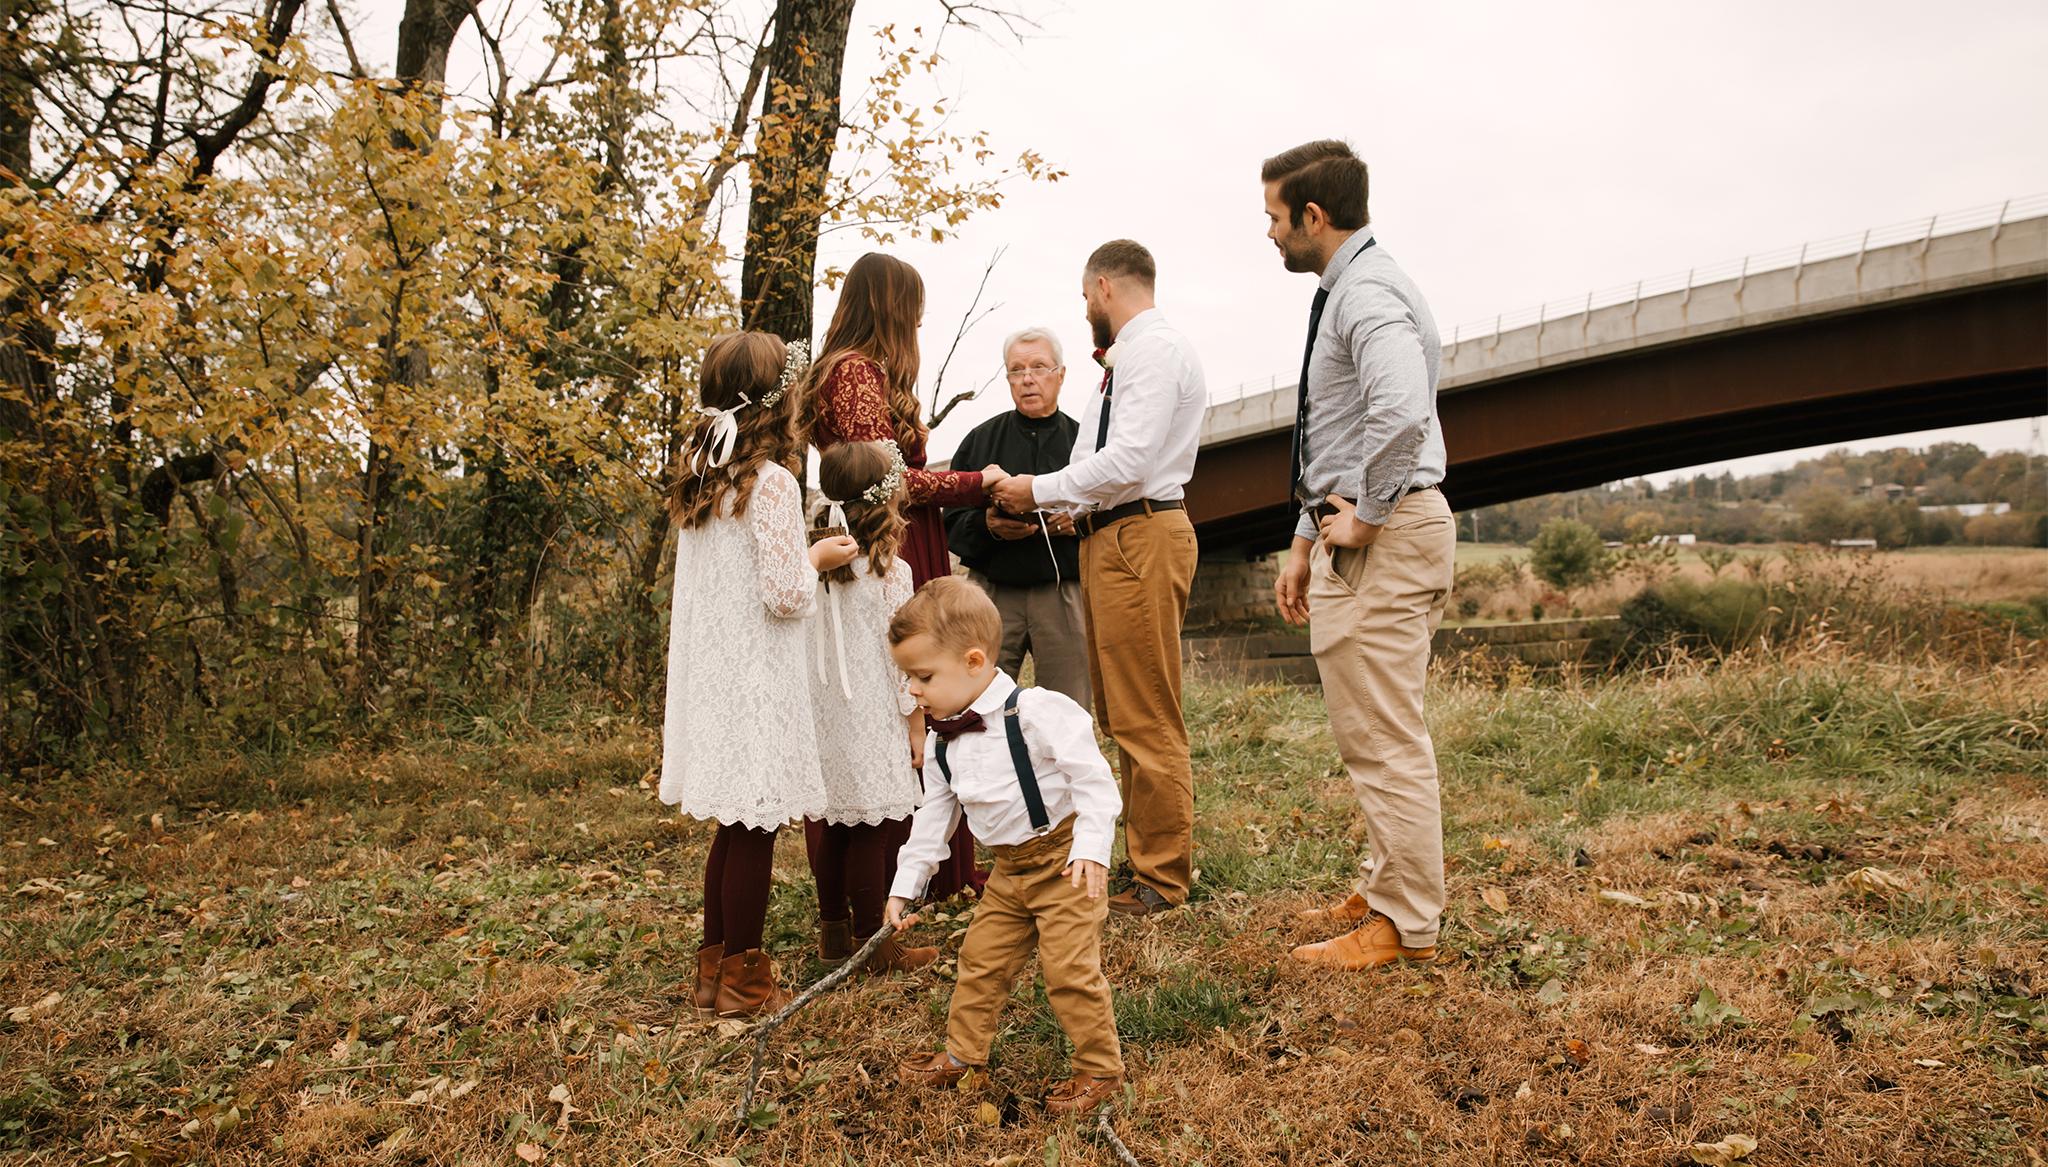 Red-Photographic-Wedding-Kentucky-Cisar-16a.JPG